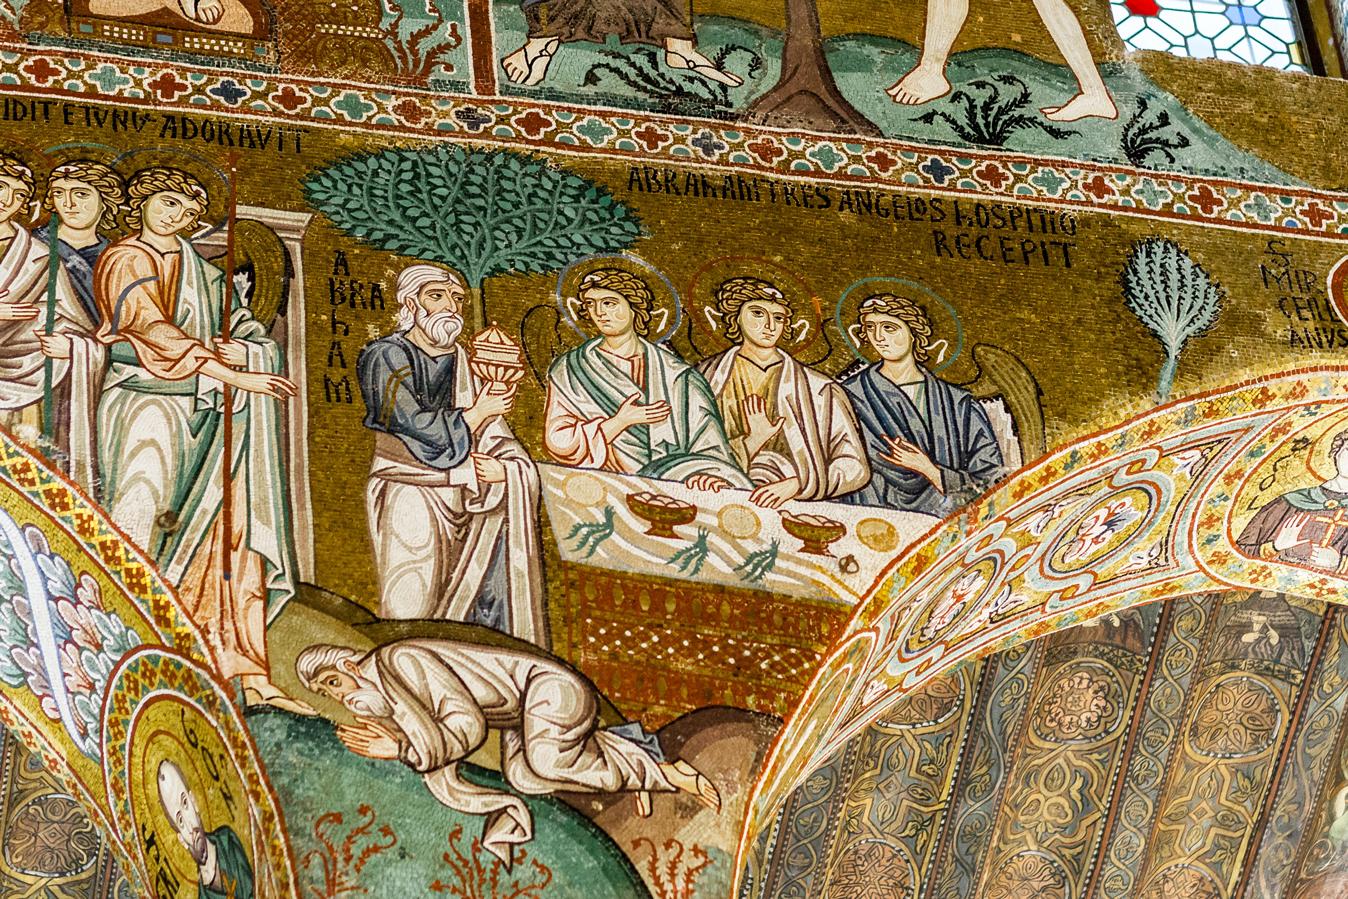 Mozaiek in klooster van Monreale